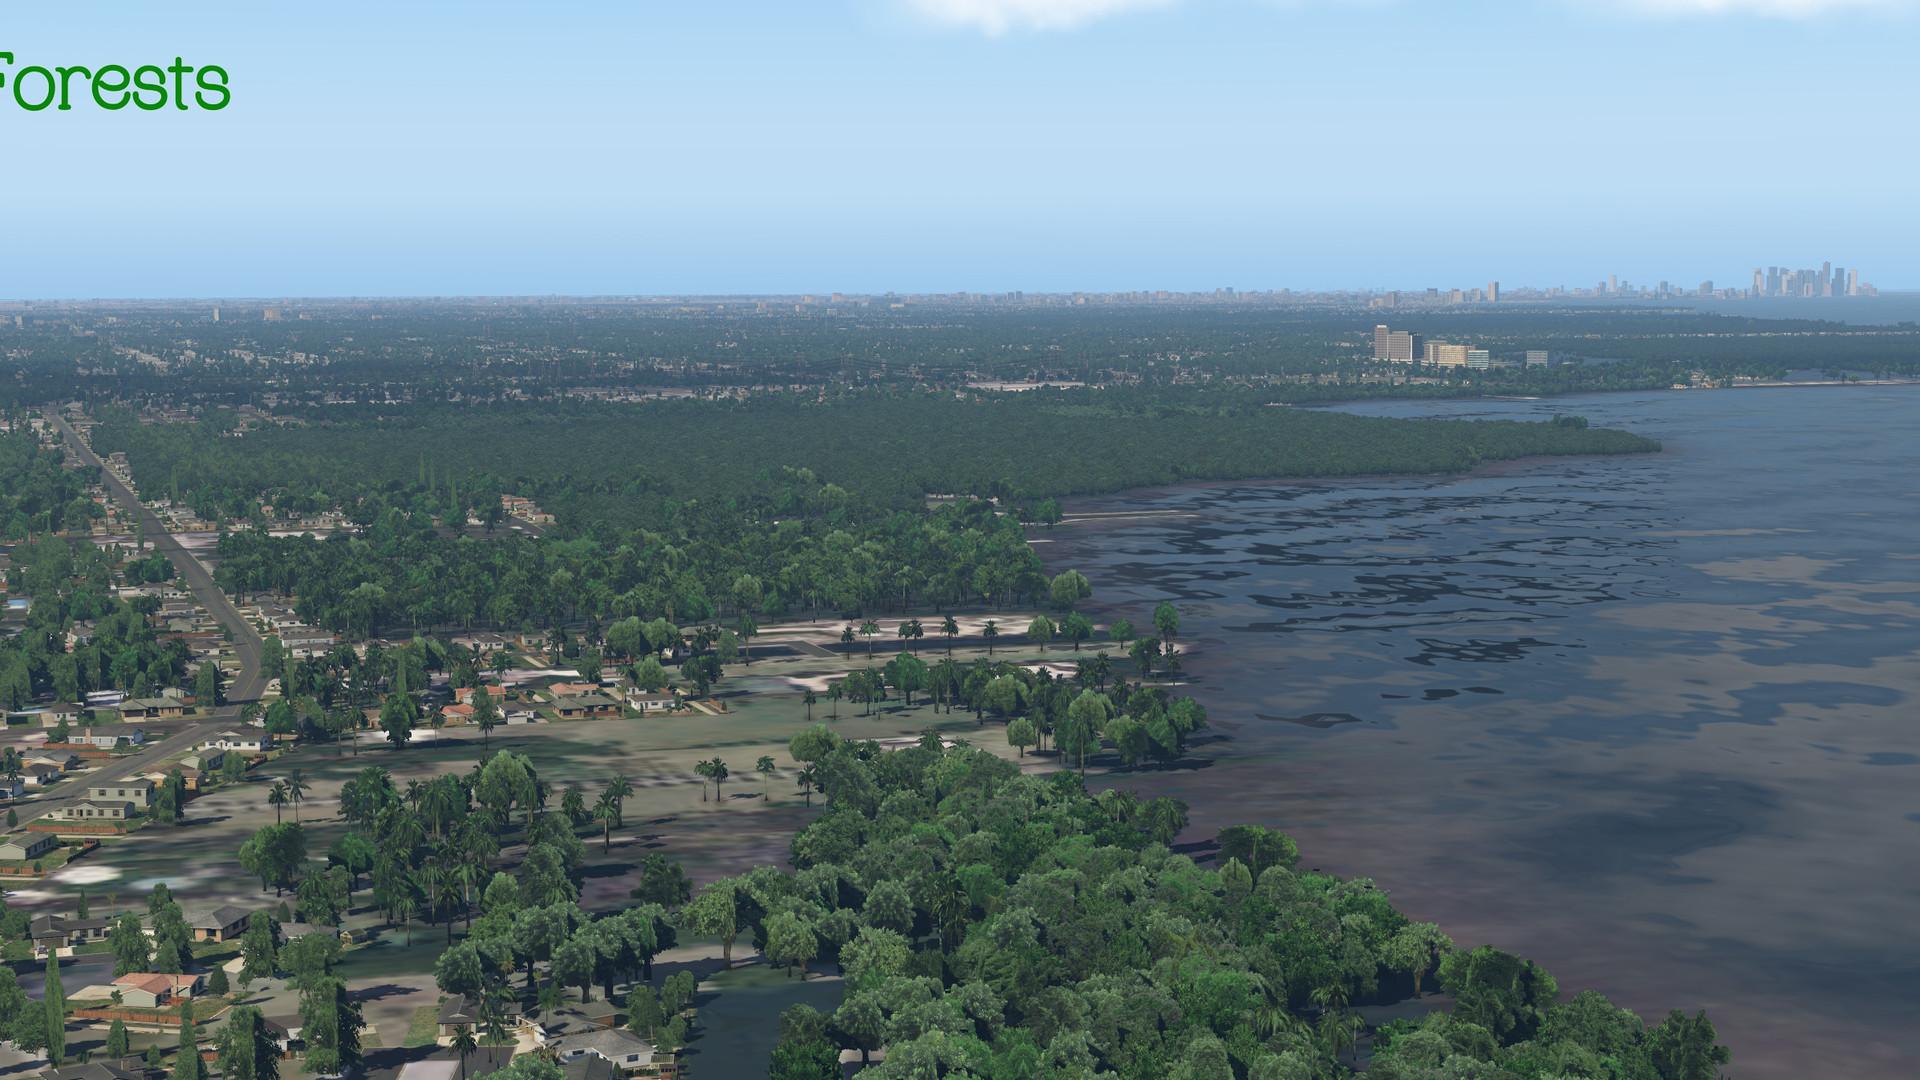 Global_Forests_Florida.jpg